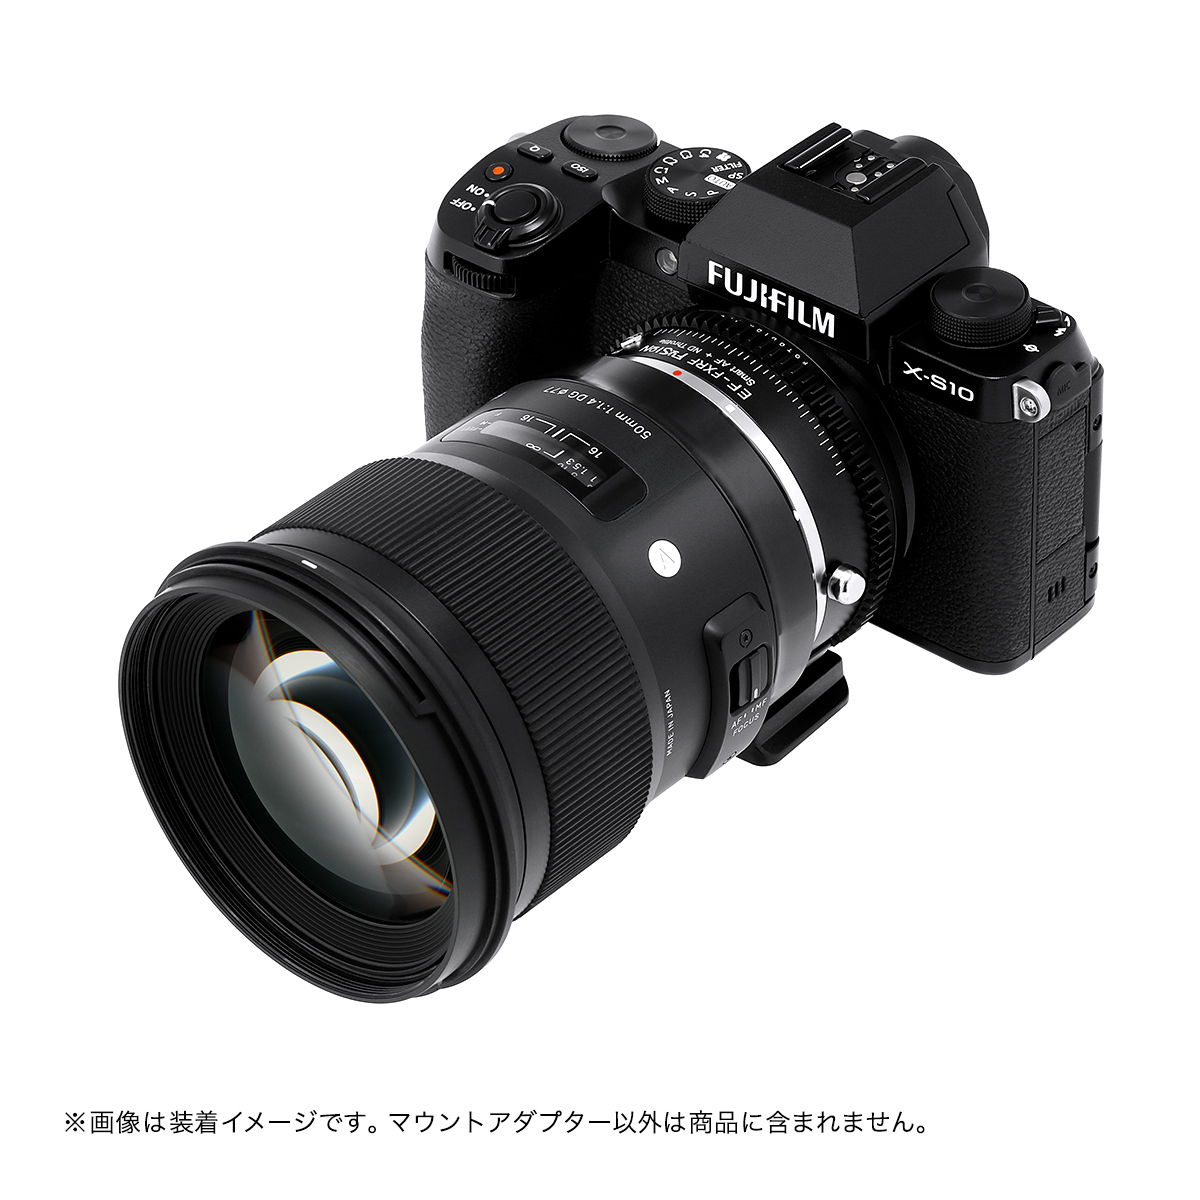 Fotodiox EF-FXRF-FSN-ND(キヤノンEFマウントレンズ → 富士フイルムXマウント変換)電子マウントアダプター 可変式NDフィルター内蔵 ファンクションボタン搭載